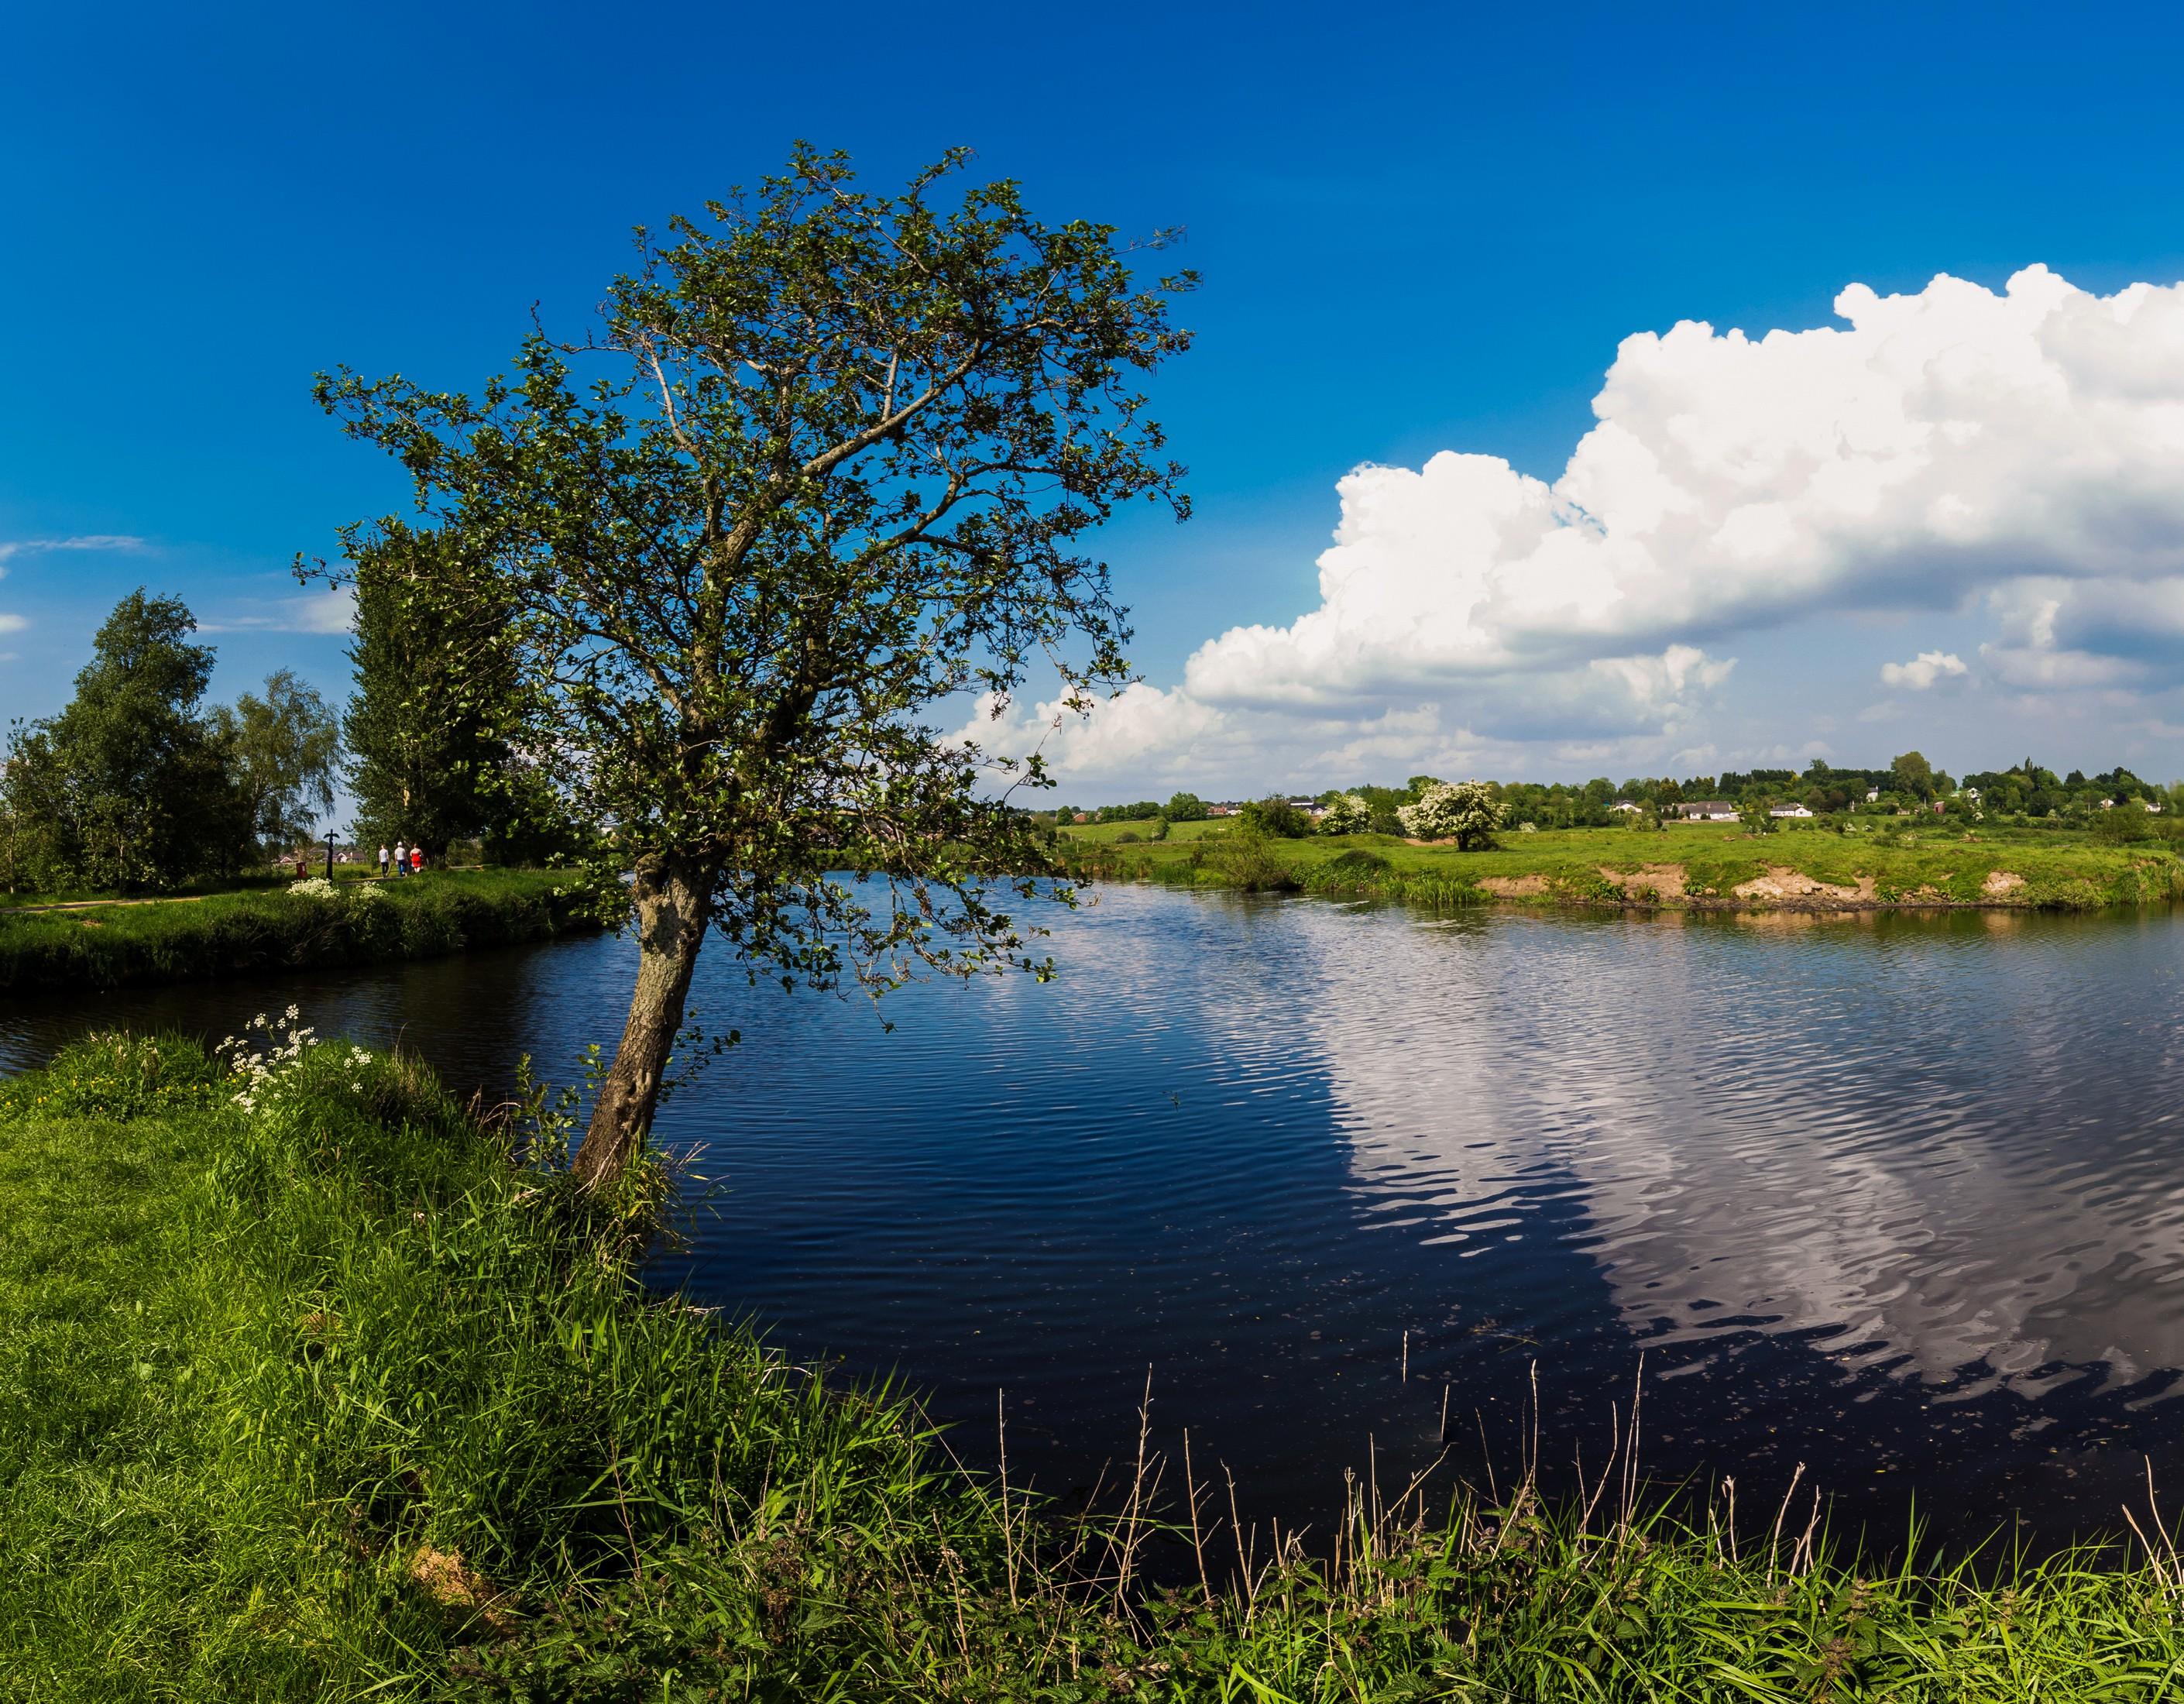 8122 northern ireland landscape wallpapers 2820x2200